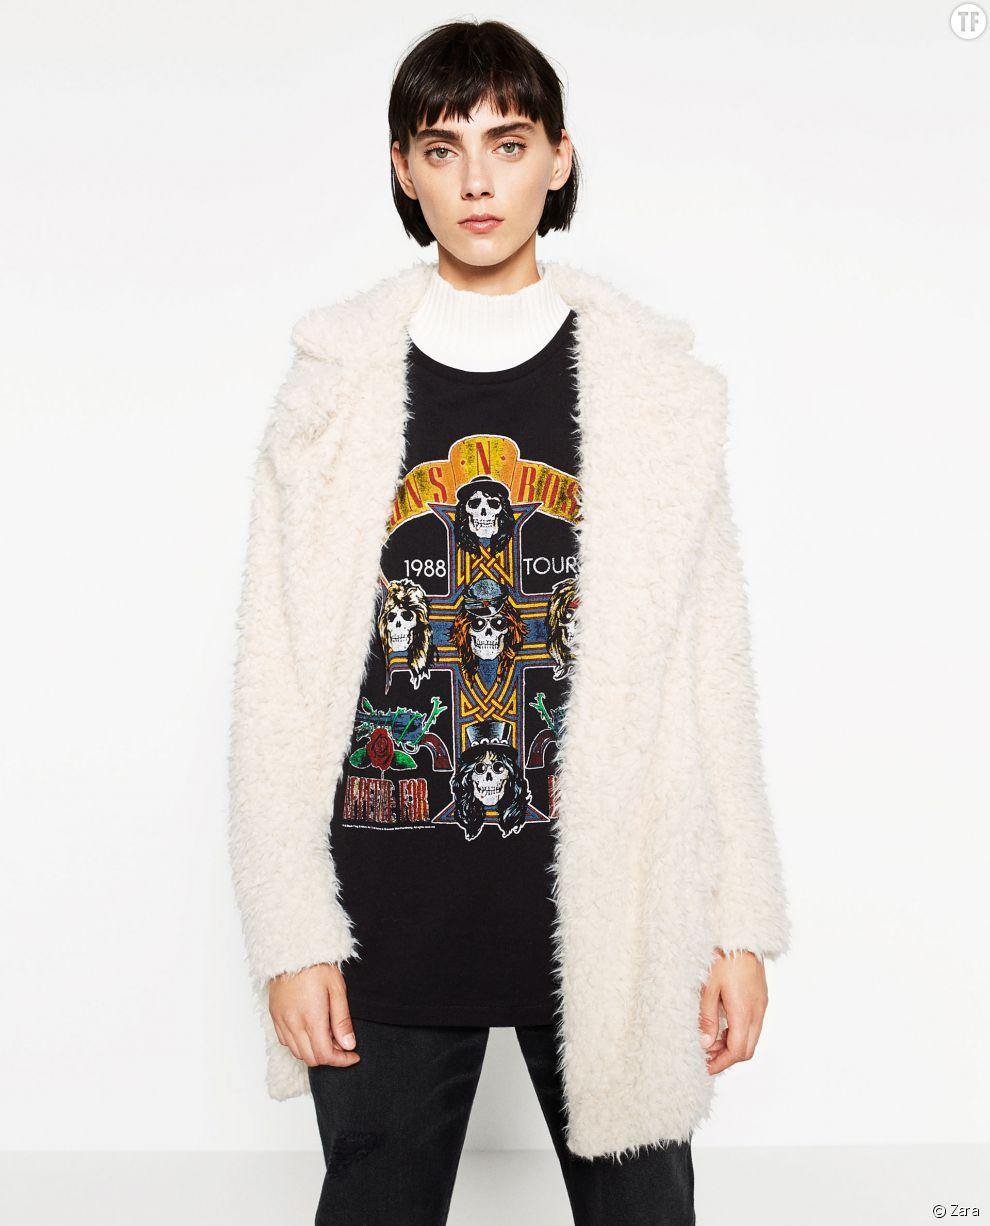 Manteau bouloché en fausse fourrure Zara 59,95 euros